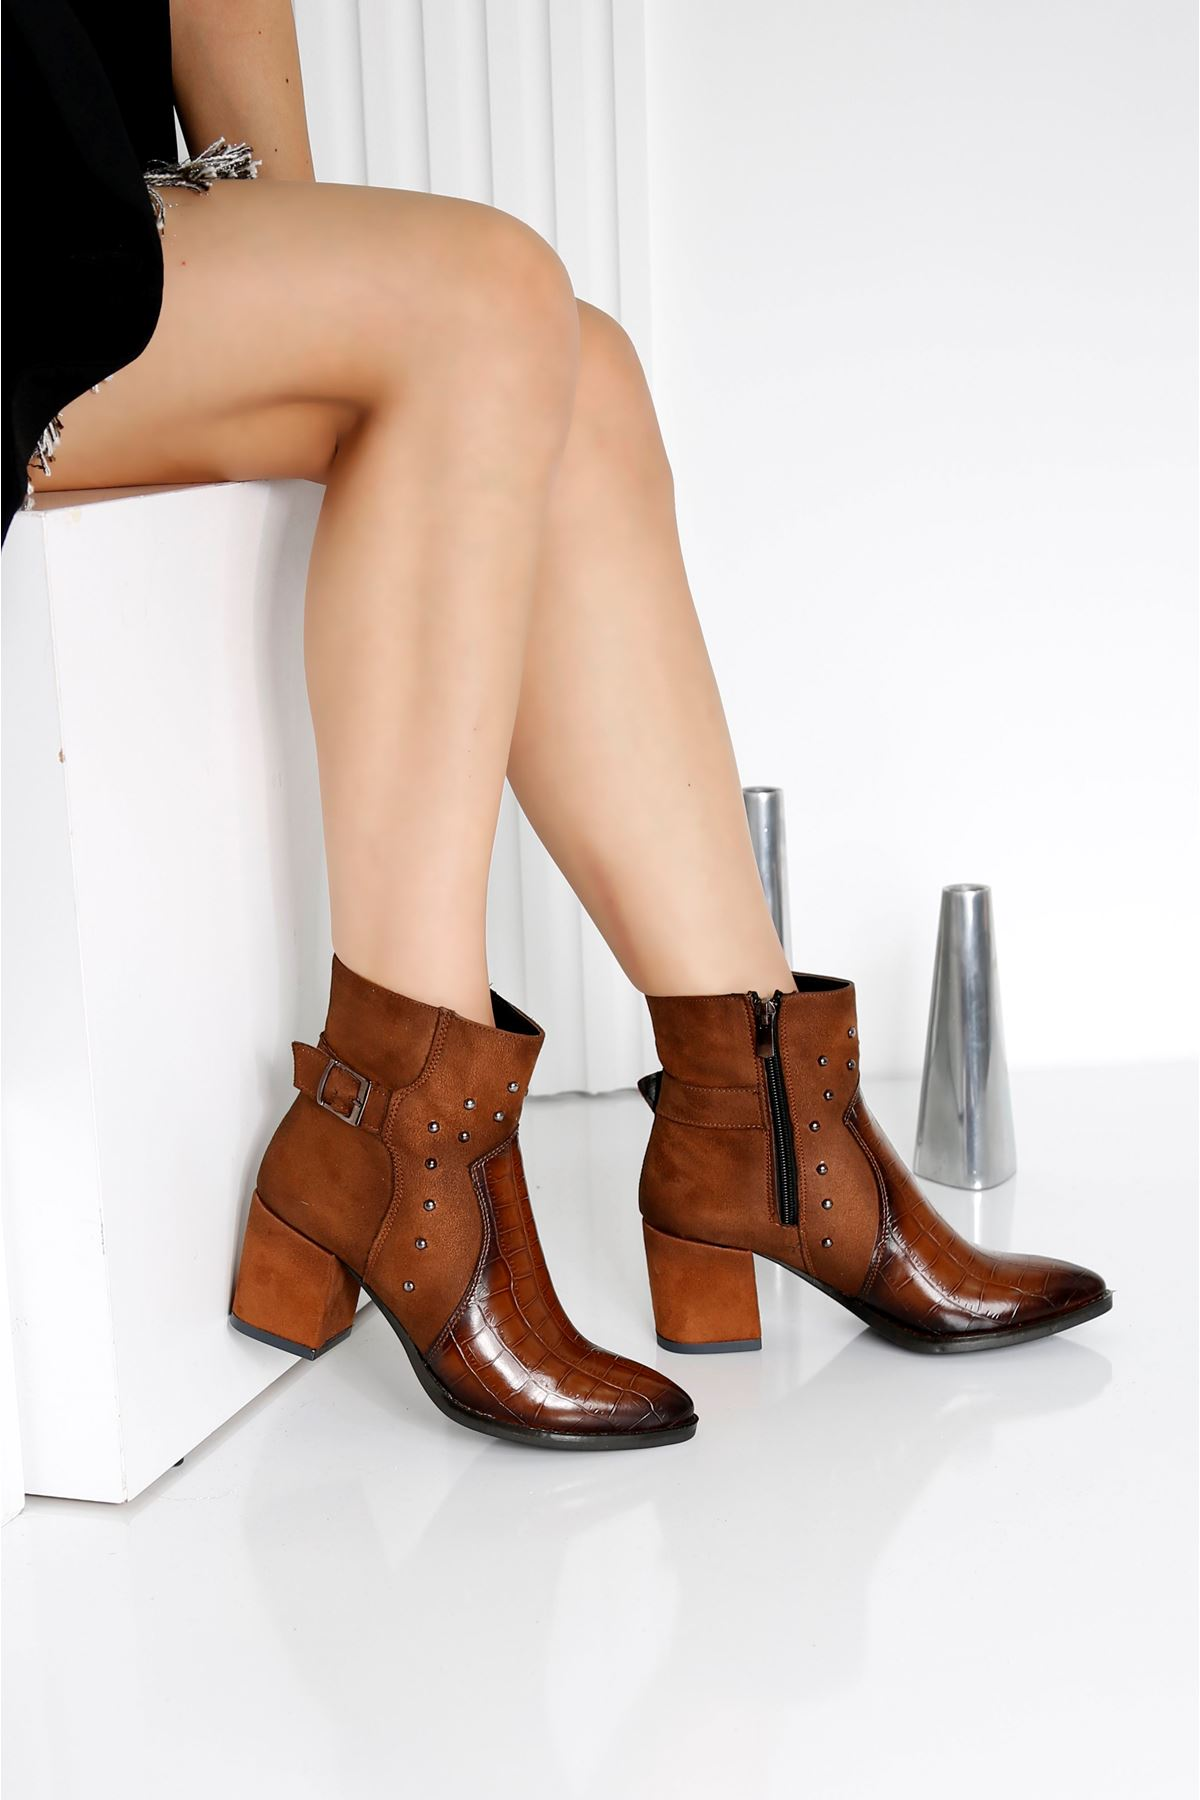 ROSE Taba Kadın Topuklu Bot